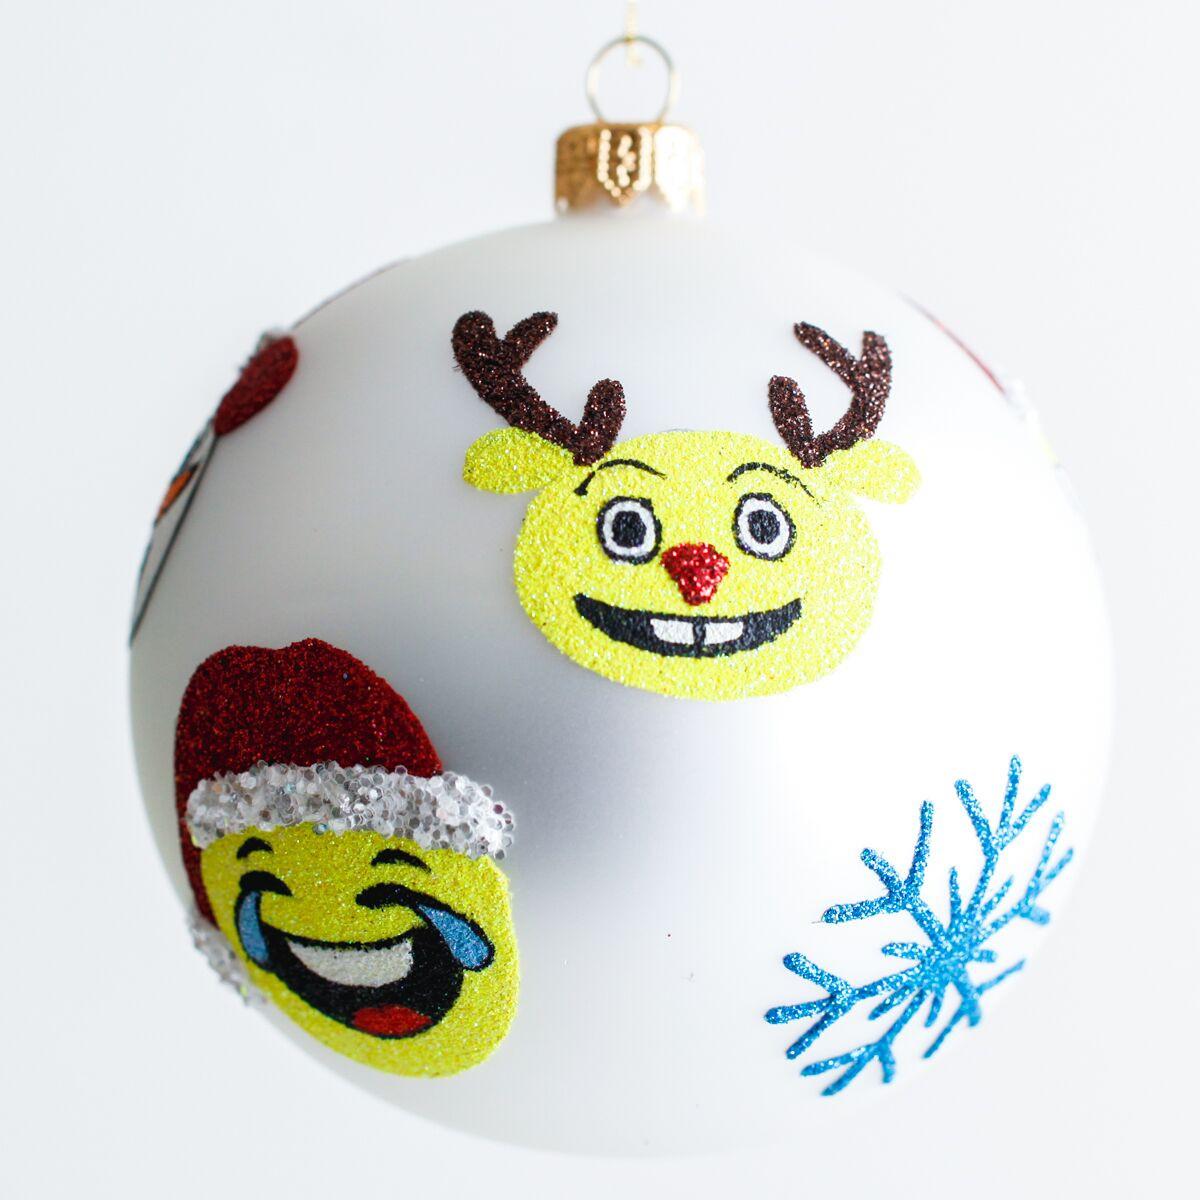 Christmas Emojis.1903 Christmas Emojis View 1